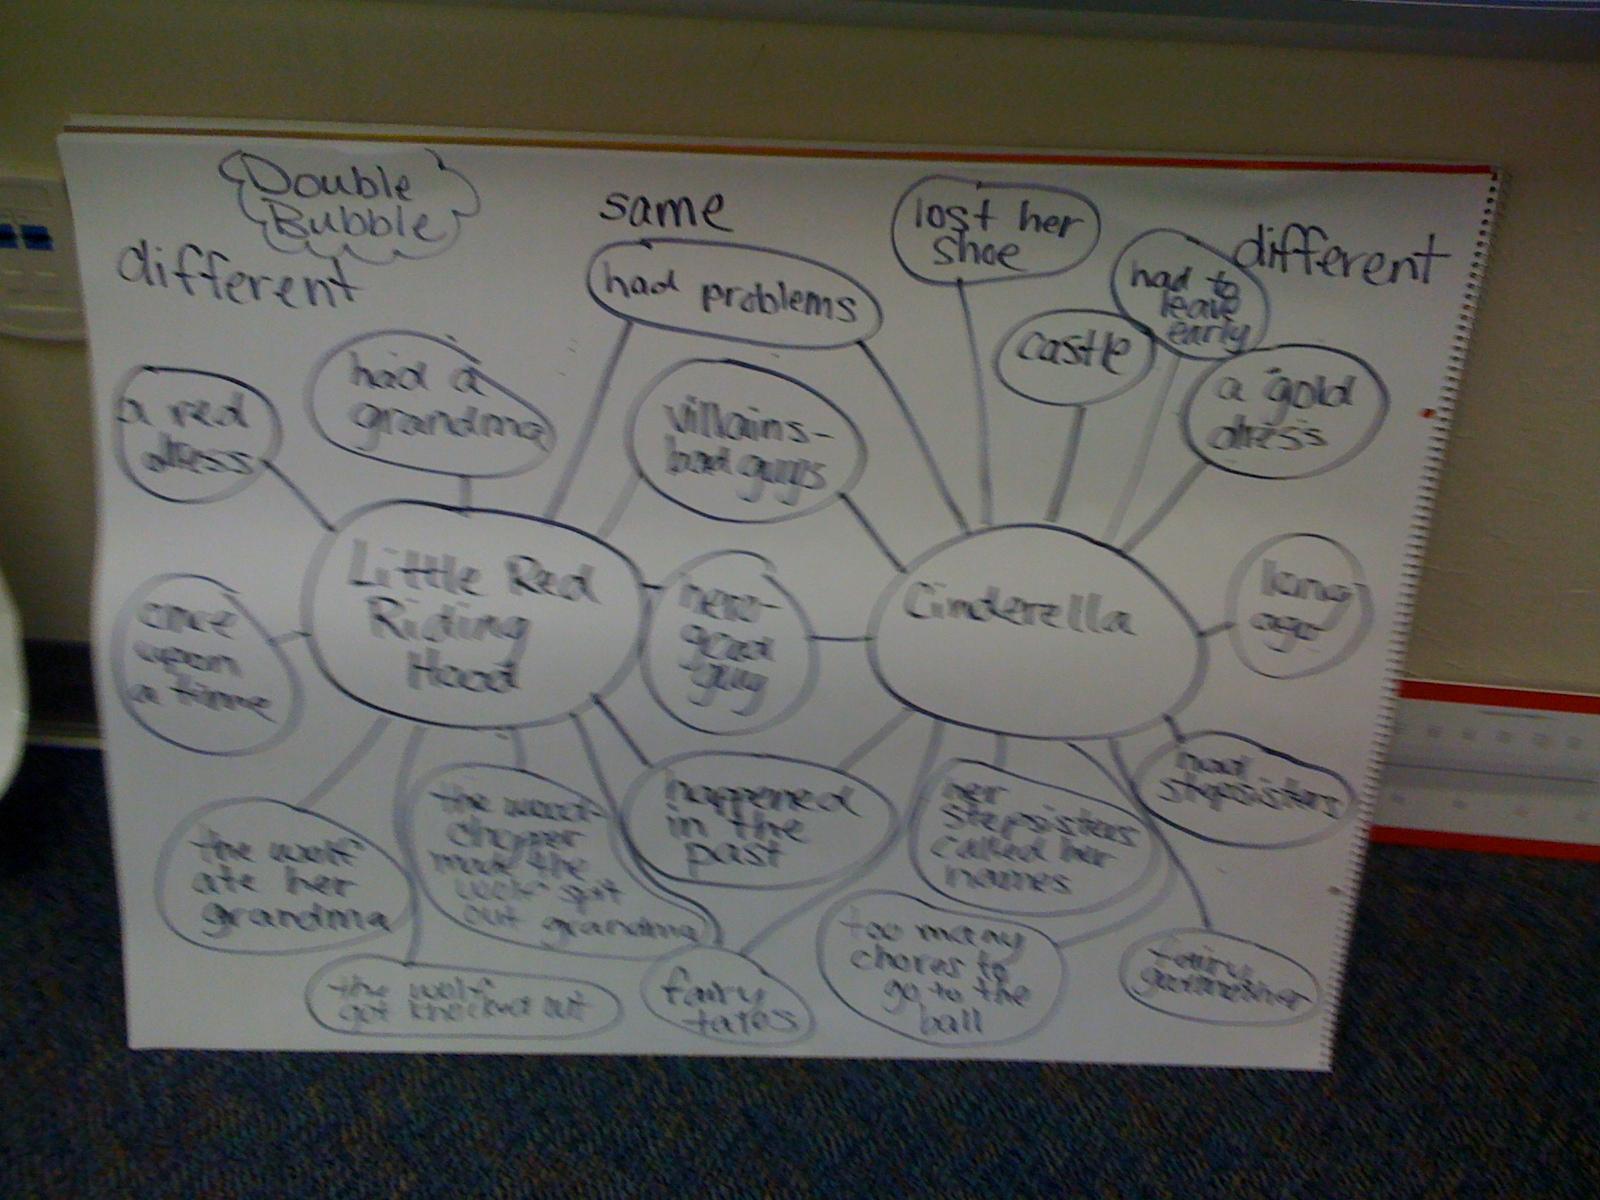 Bishop S Blackboard An Elementary Education Blog